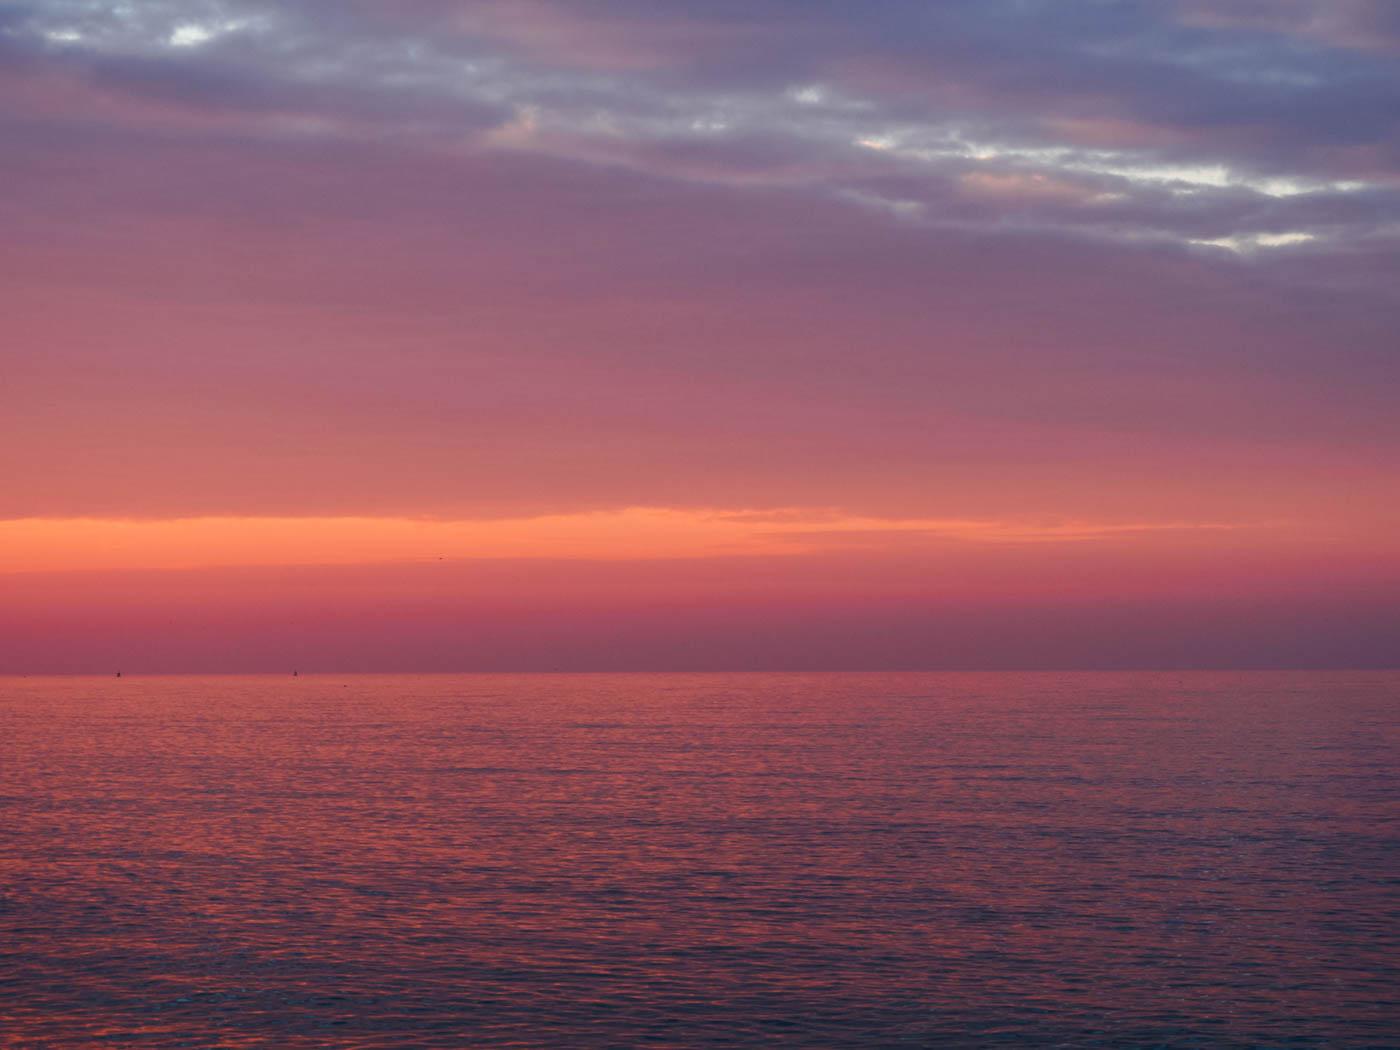 North Sea in December